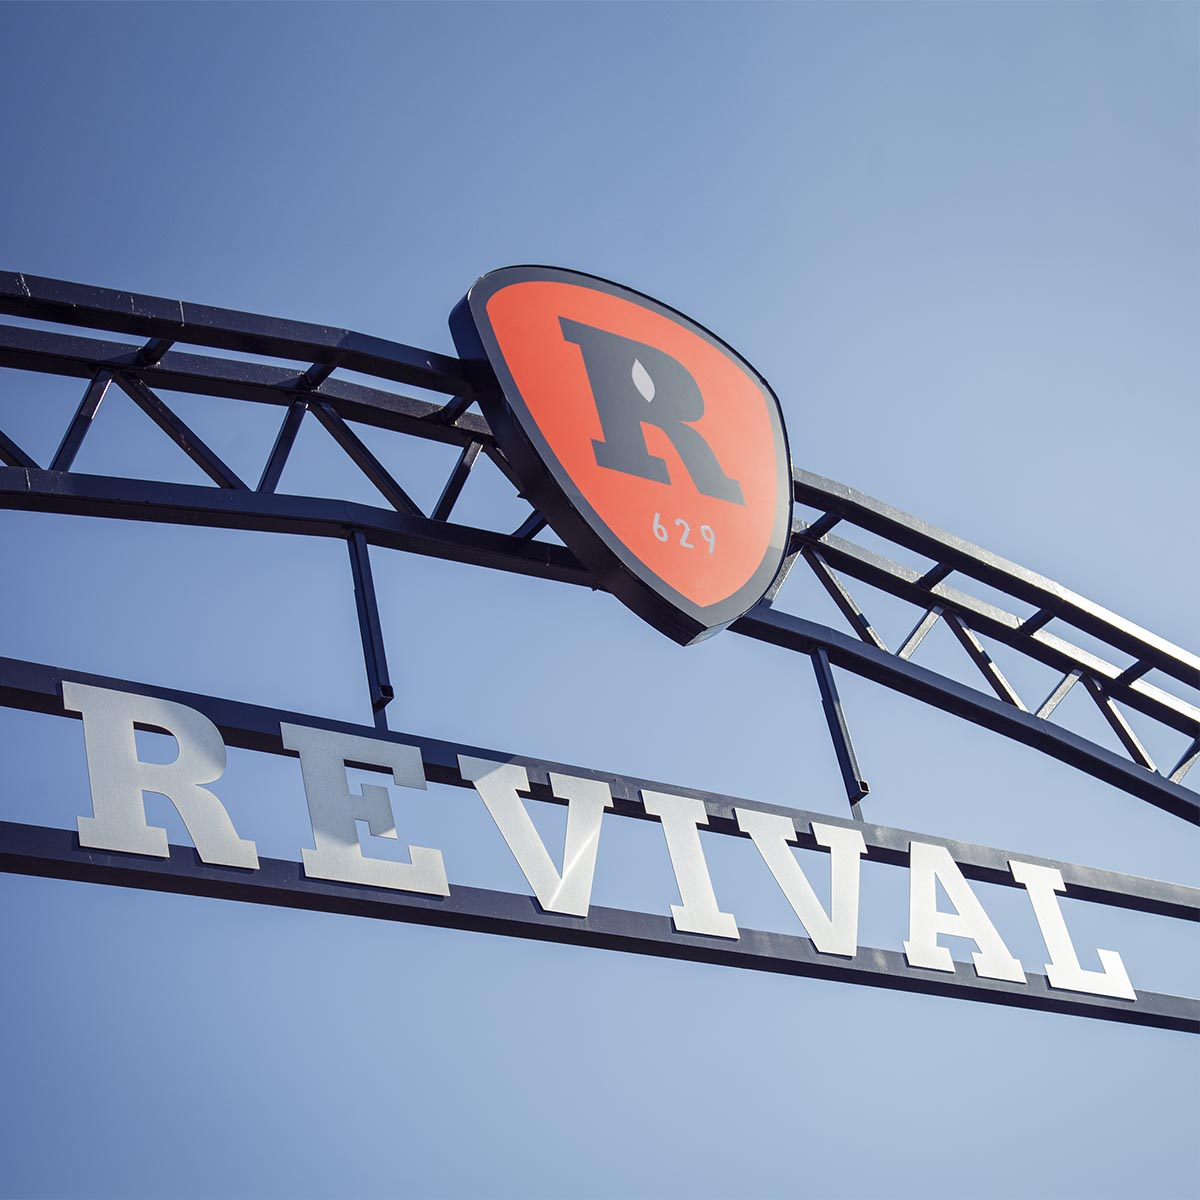 Revival_14.jpg